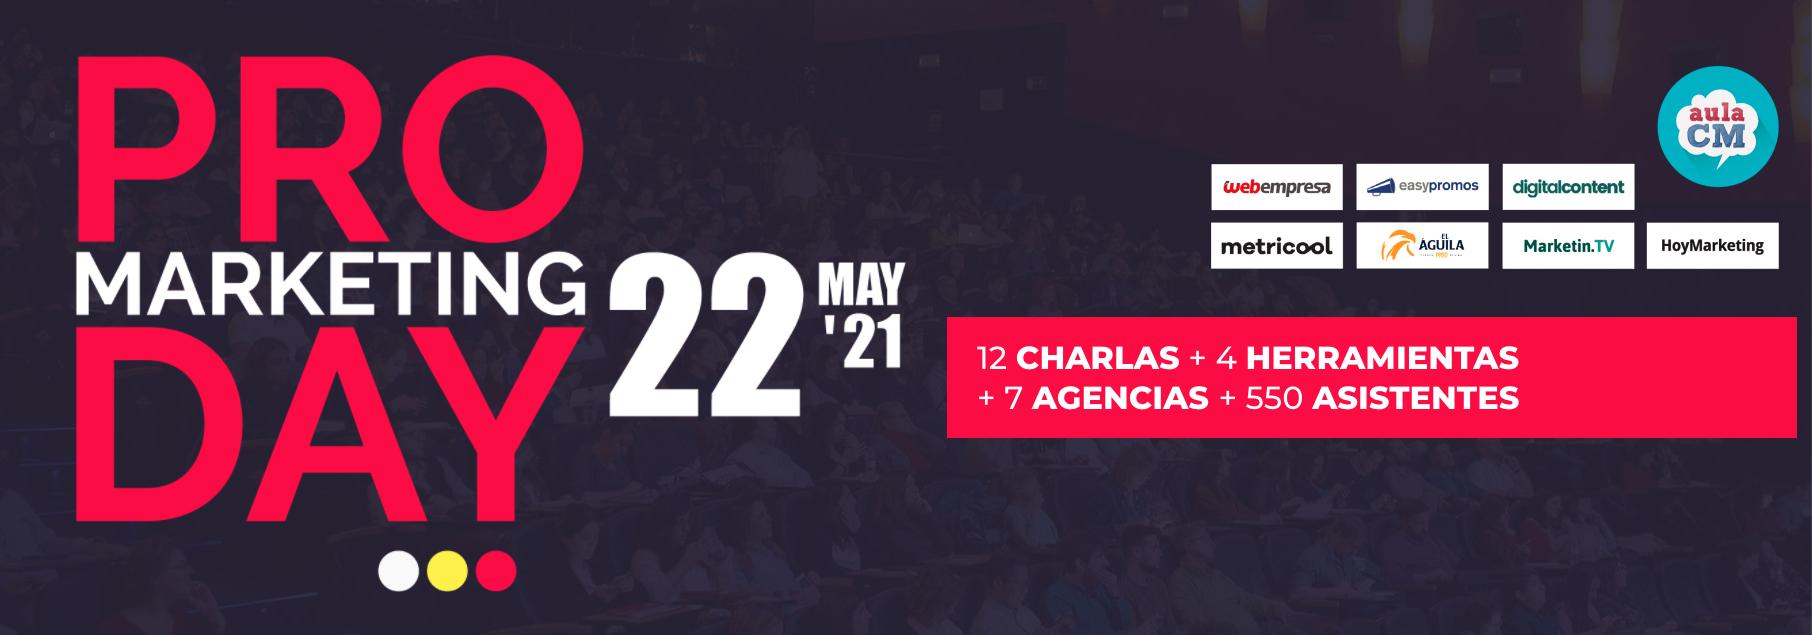 eventos marketing 2021 Pro-Marketing Day